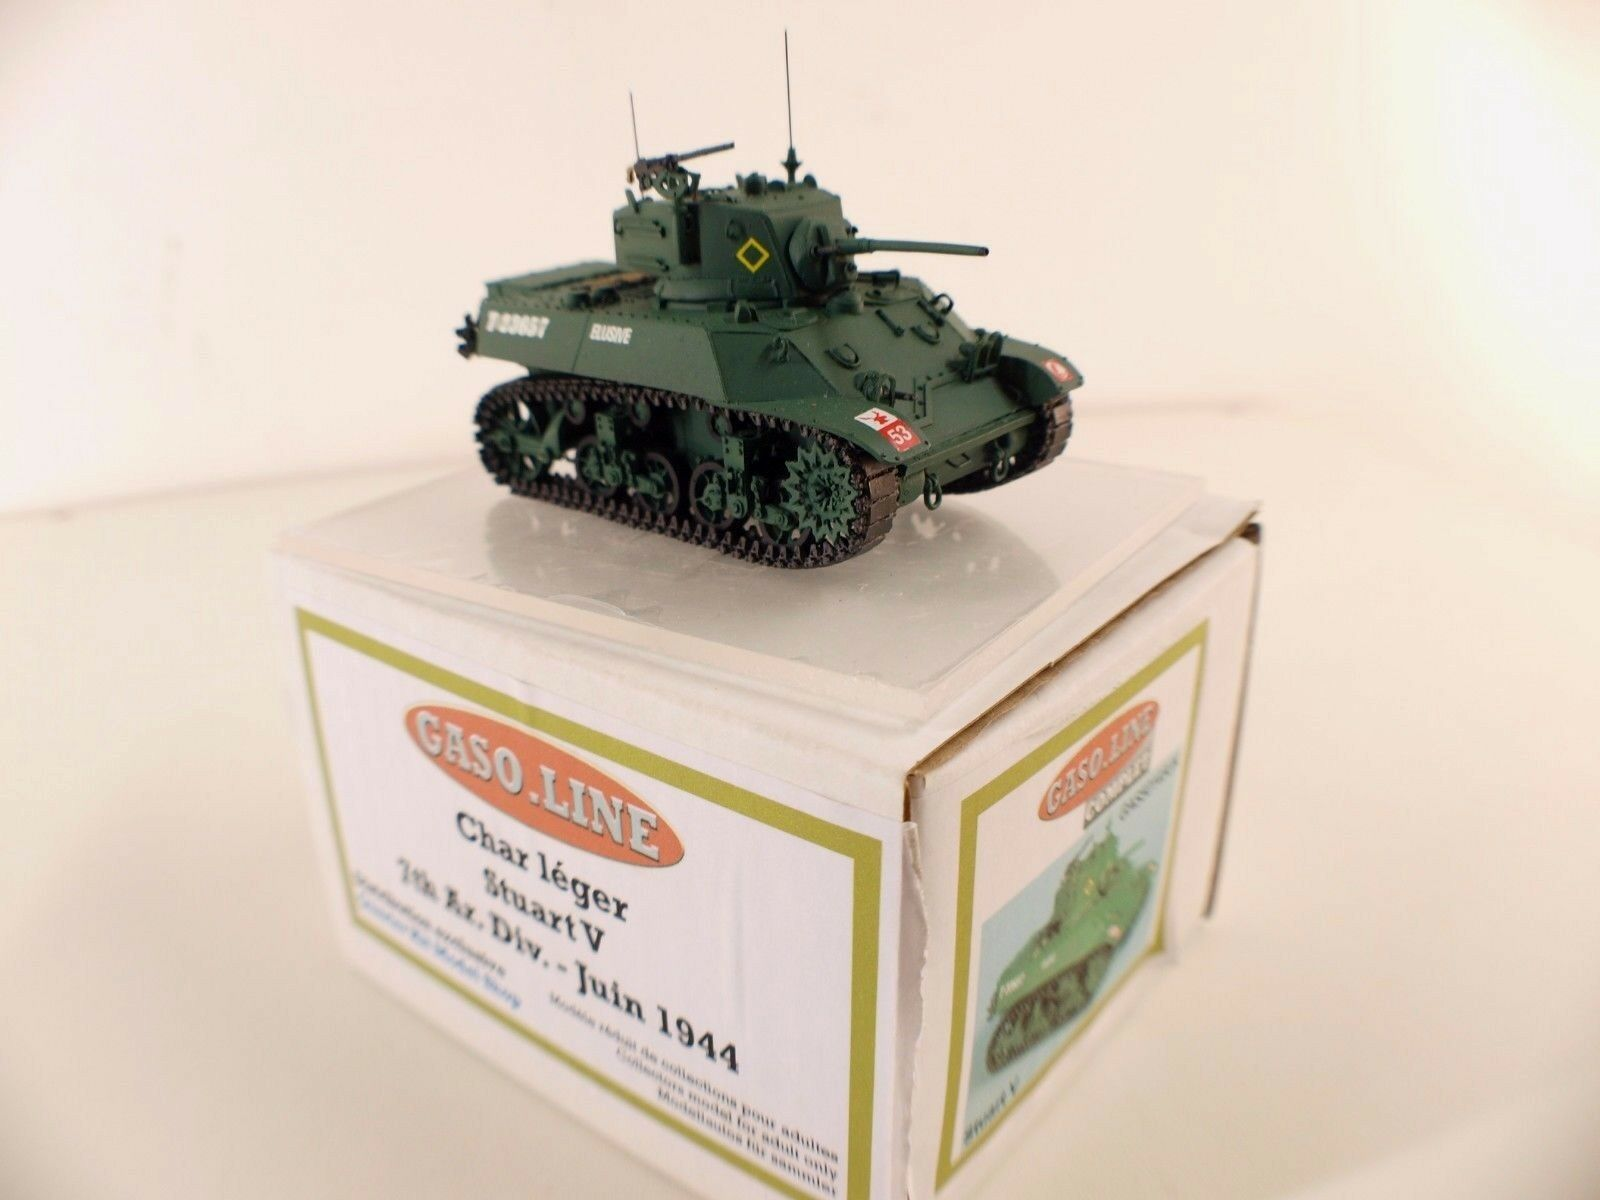 Gaso.line Gas50145uk Tanque Ligero Stuart V 7th Ar.div. Jun 1944 Nuevo Caja Mint